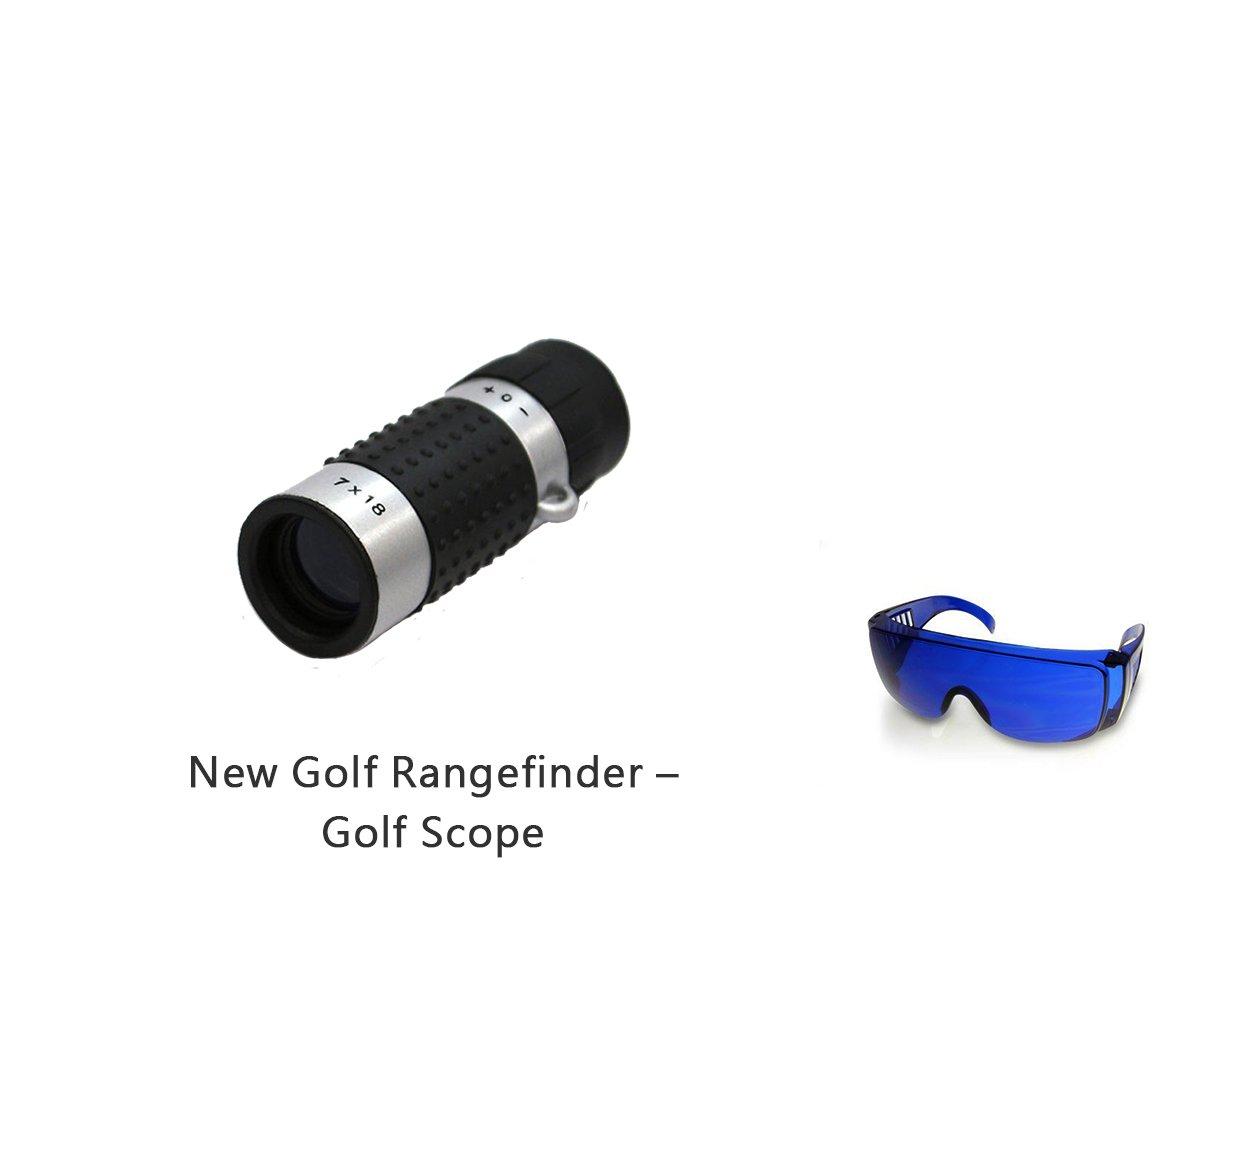 Posma GF100B Bundle set Golf Rangefinder High Definition Mini Monocular Pocket Scope + Golf Ball Finder Hunter Retriever Glasses